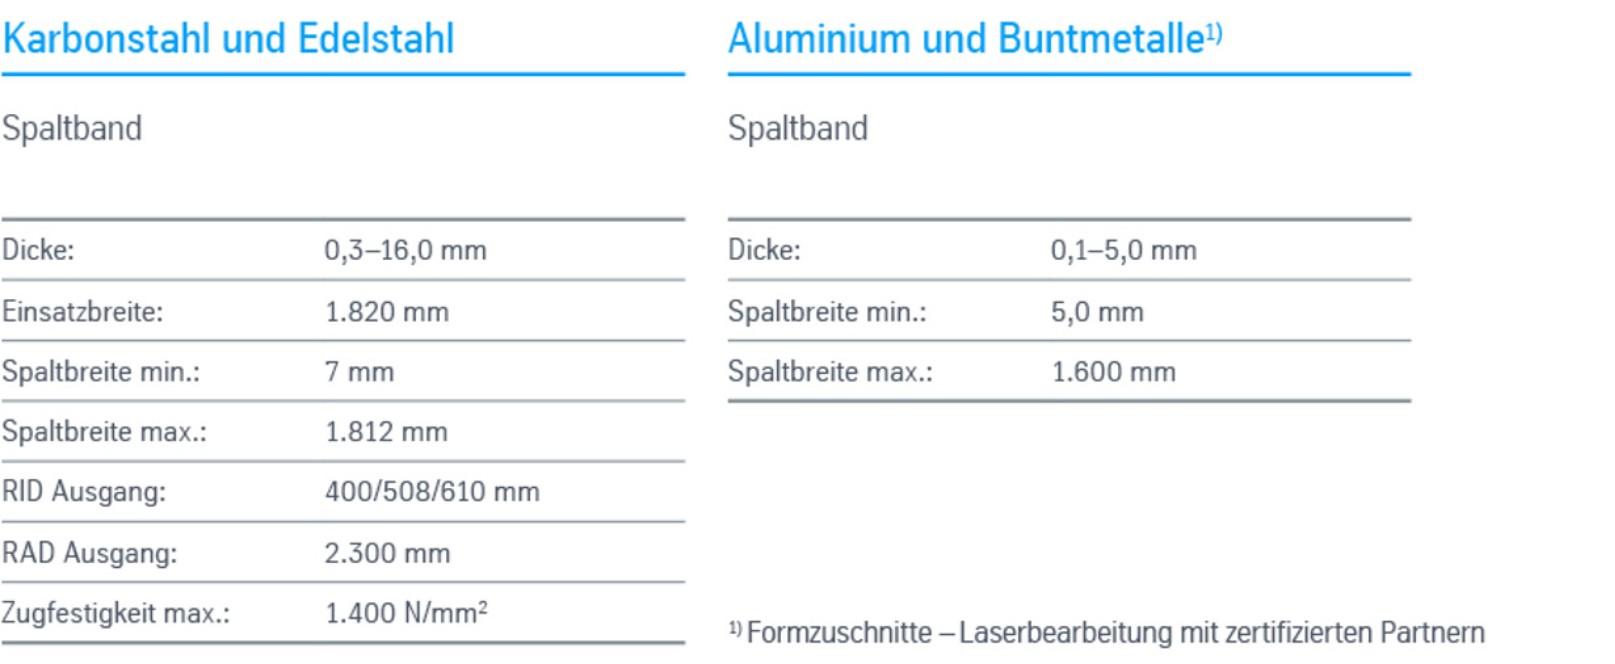 Anarbeitung Spaltband-Schmalband